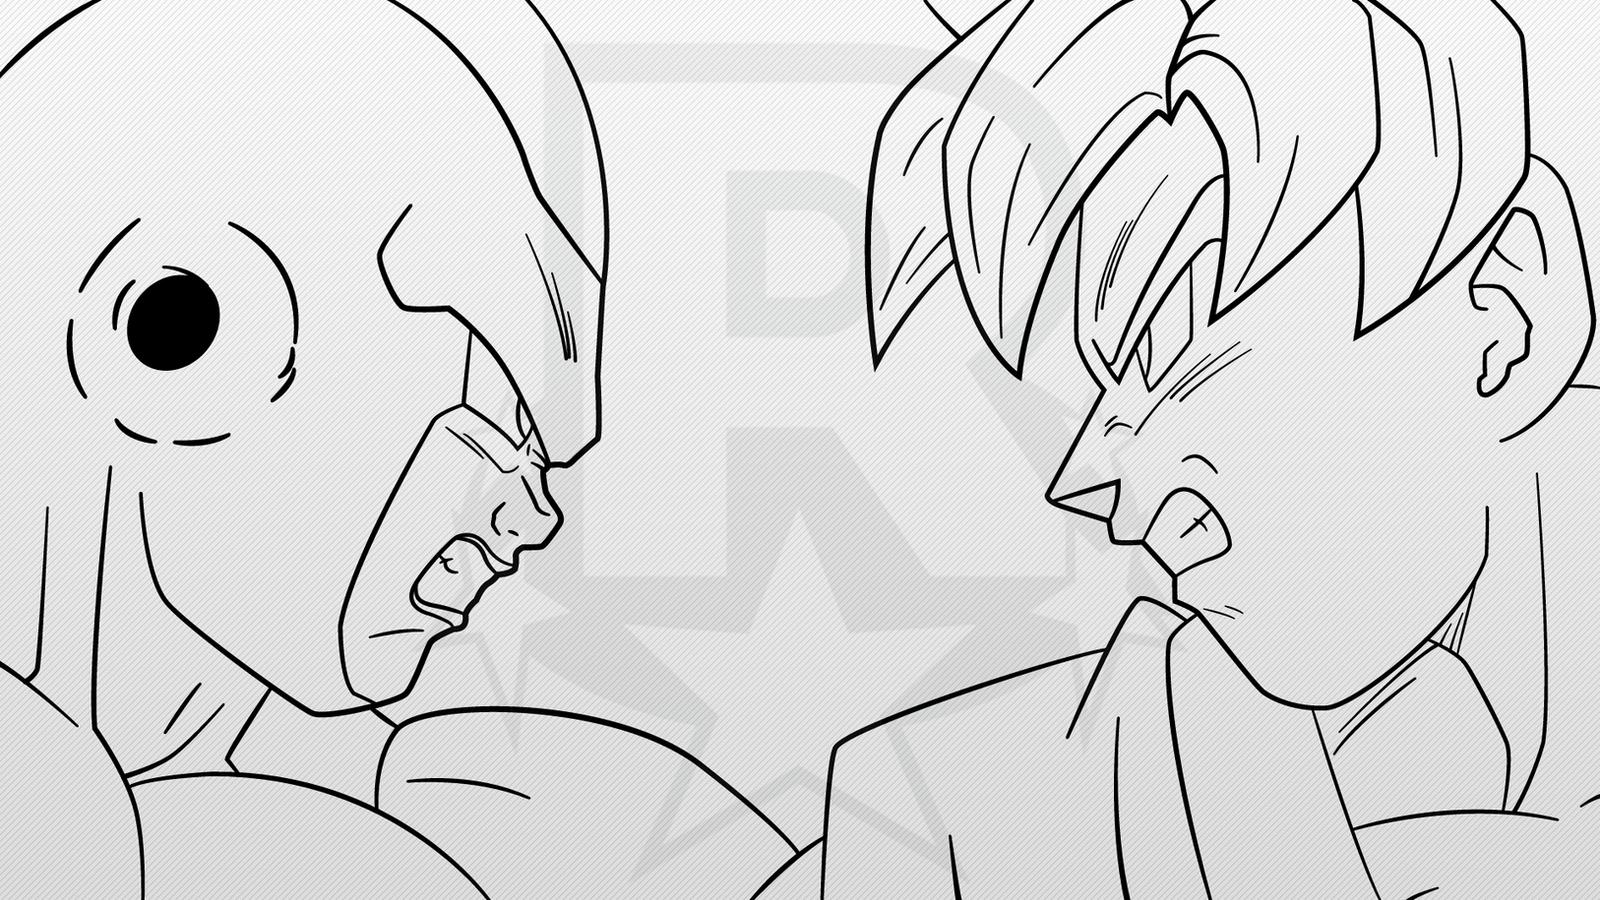 Golden Freezer Para Colorear: Super Saiyan Blue Goku Vs Golden Frieza (Line-Art) By